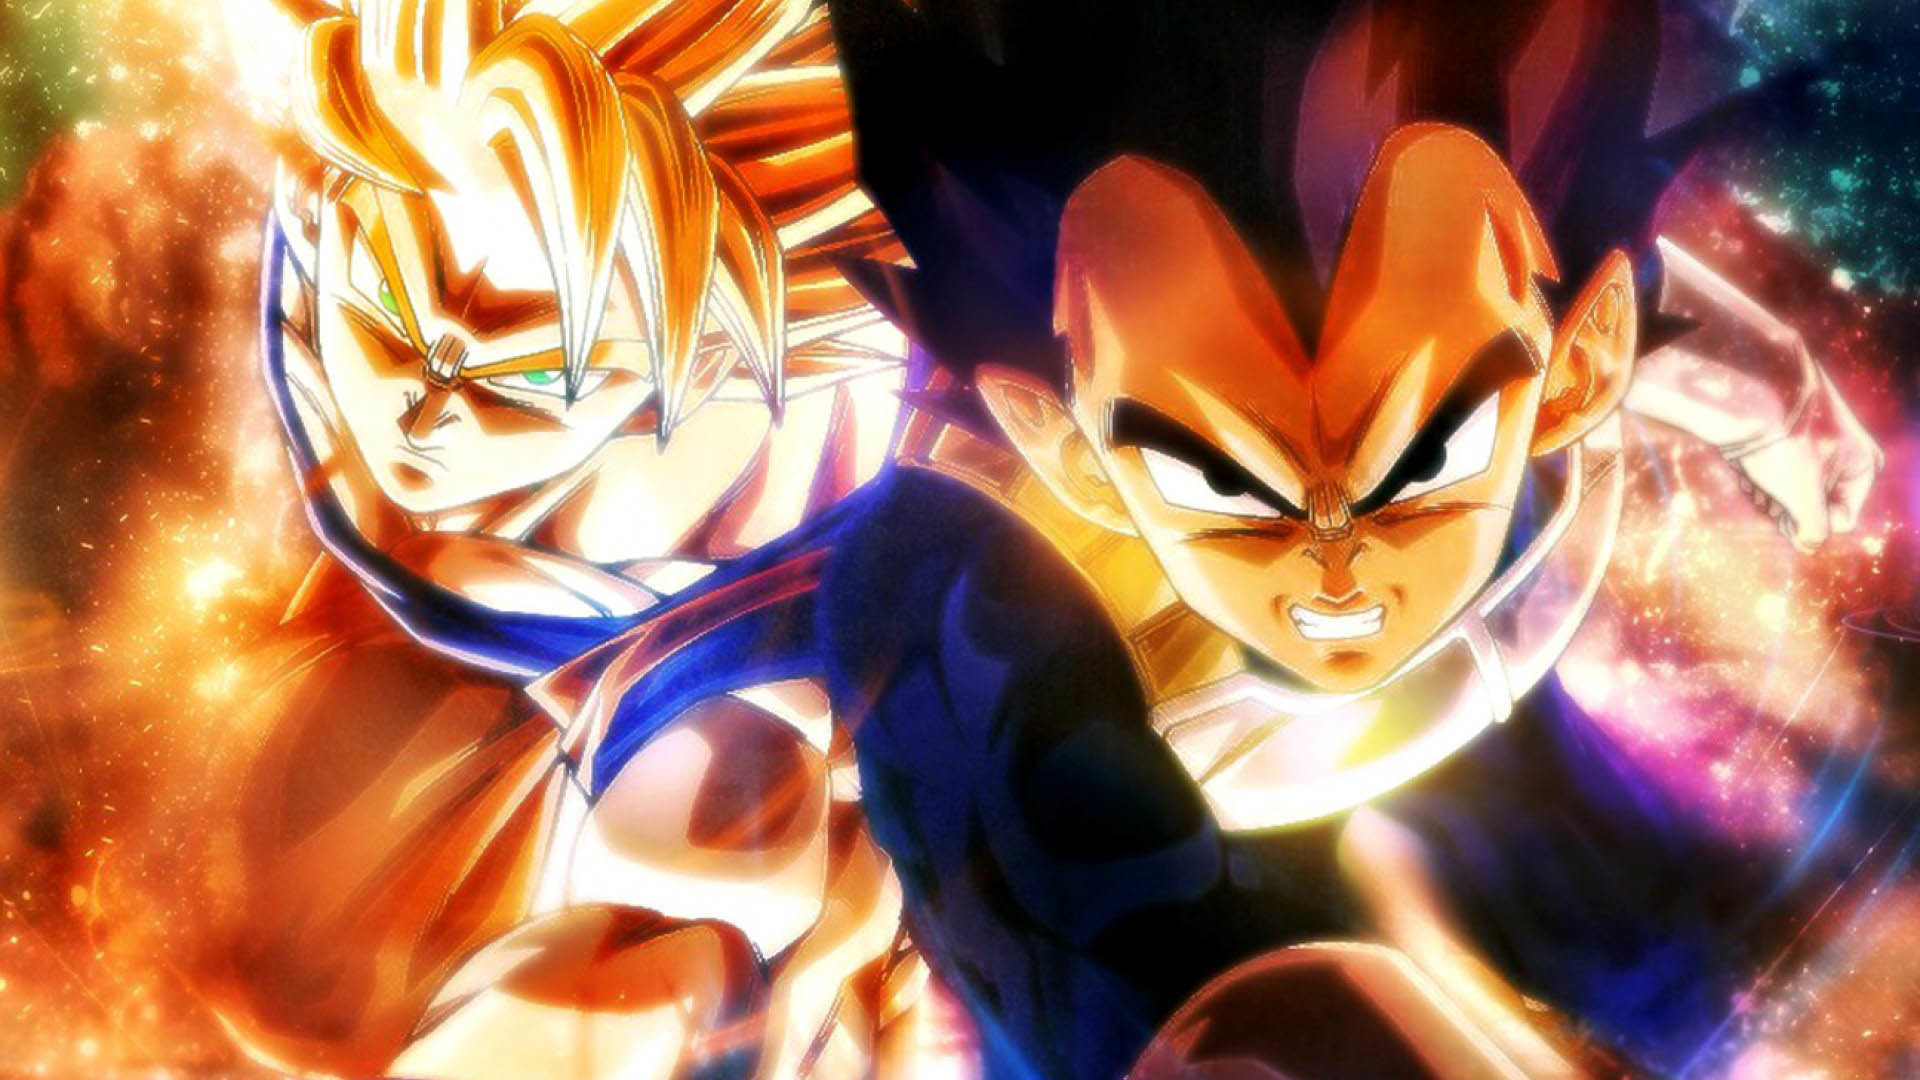 Dragon Ball – Goku & Vegeta wallpaper